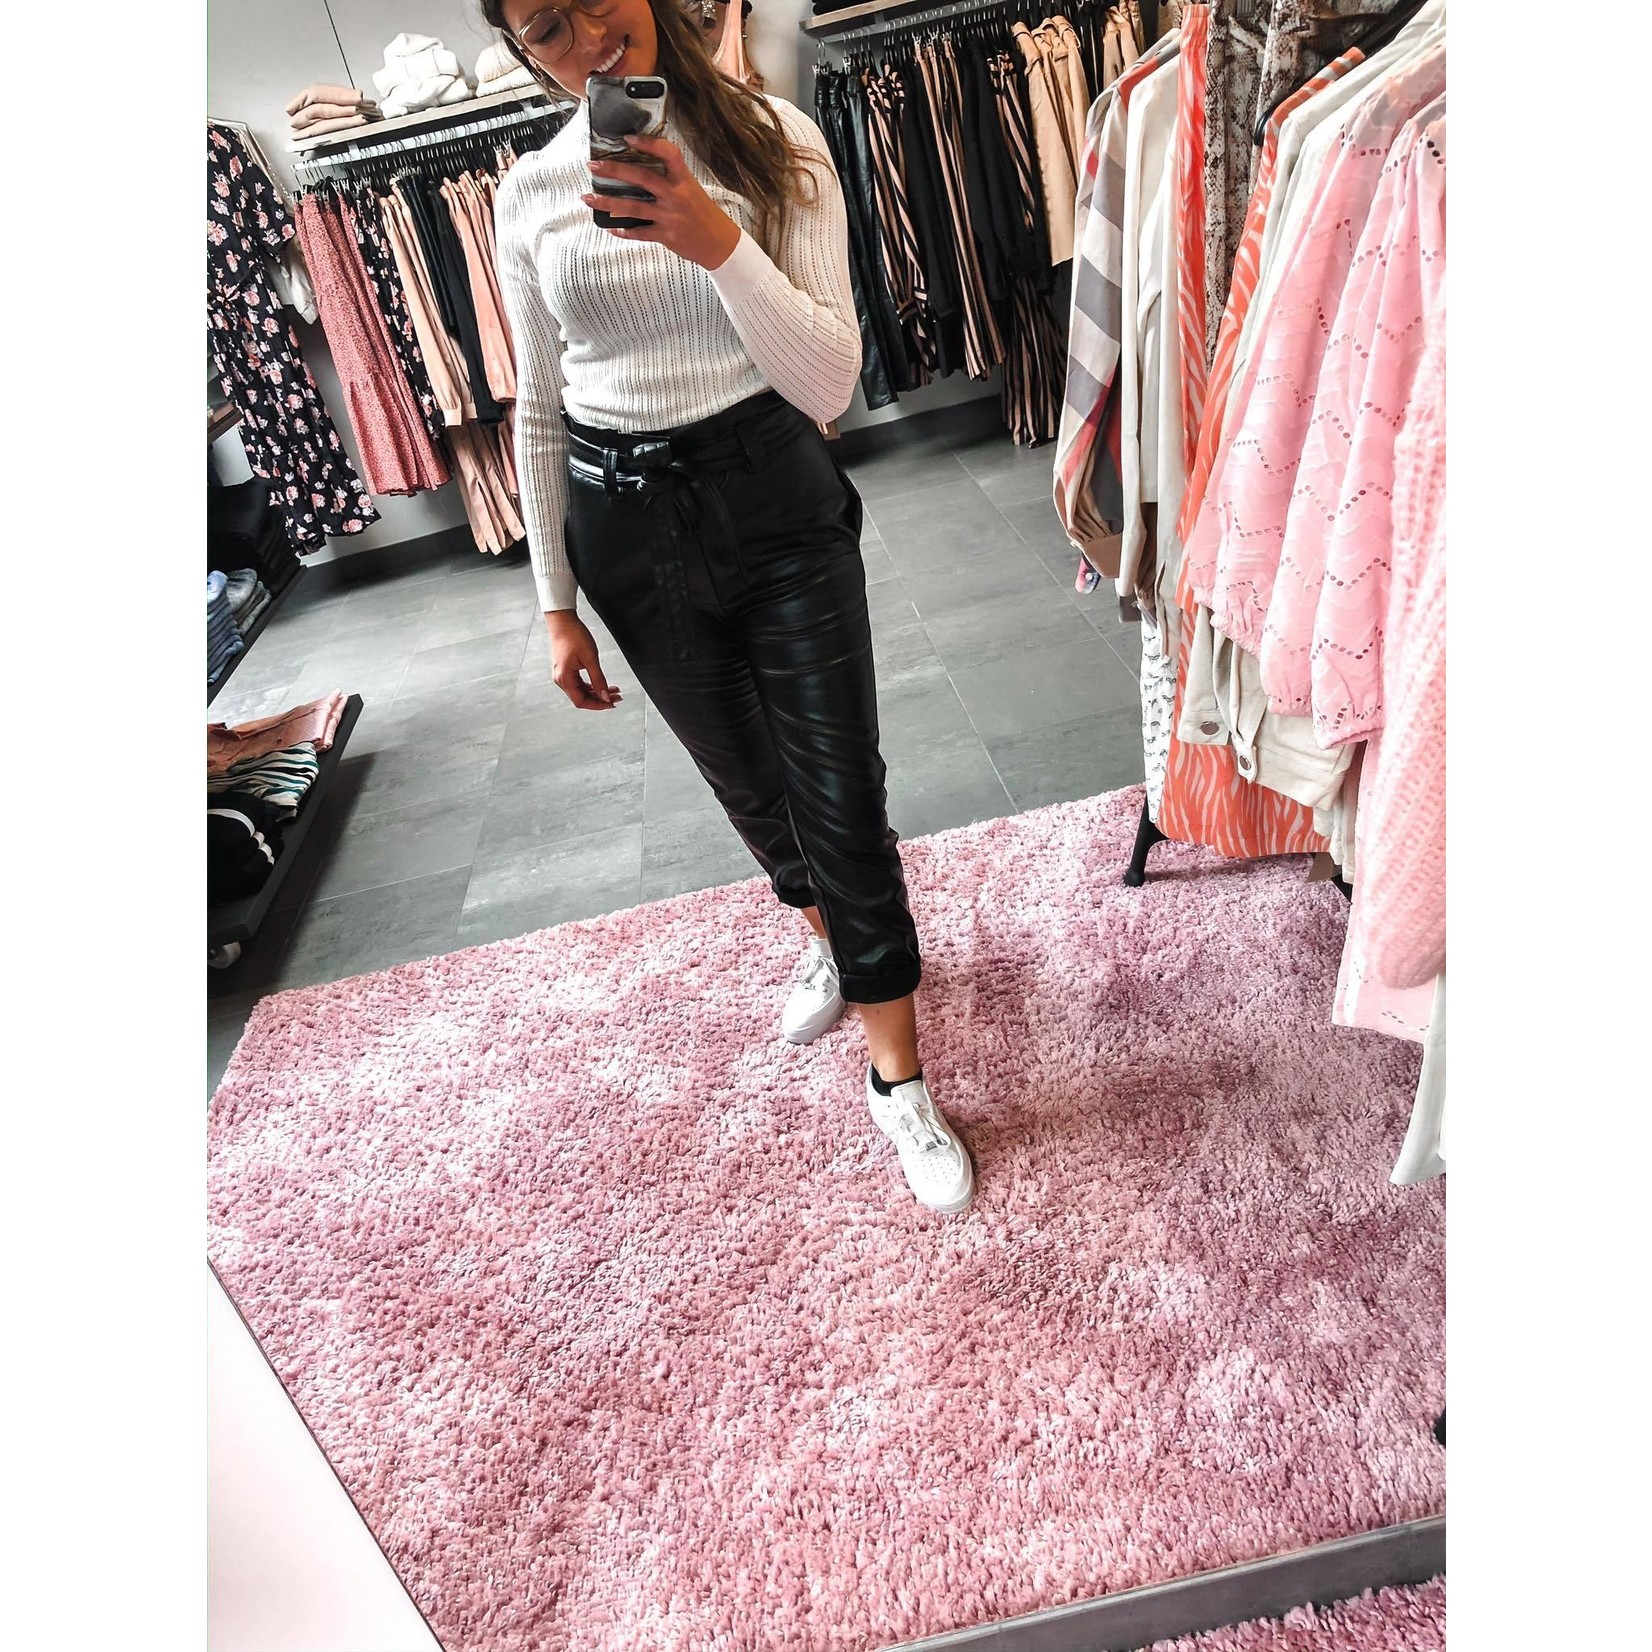 Tara Pu pants black